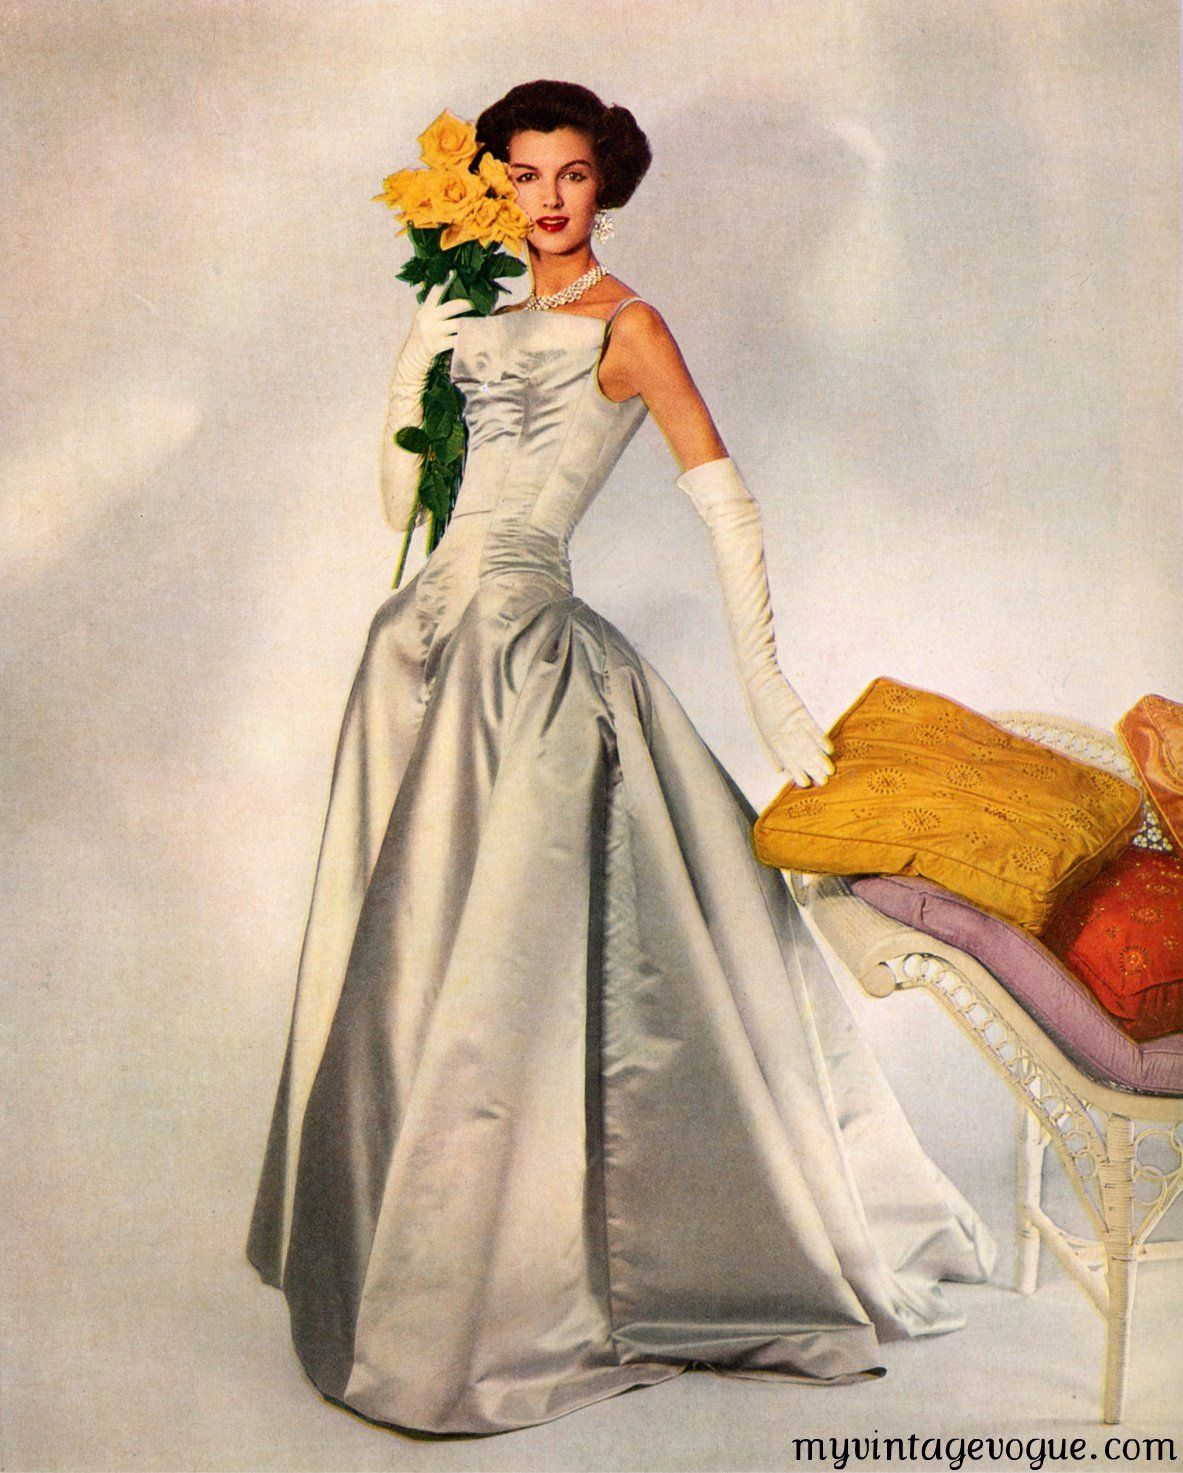 Modess 1959, 1950s / 50s vintage fashion | 1950s Style | Pinterest ...